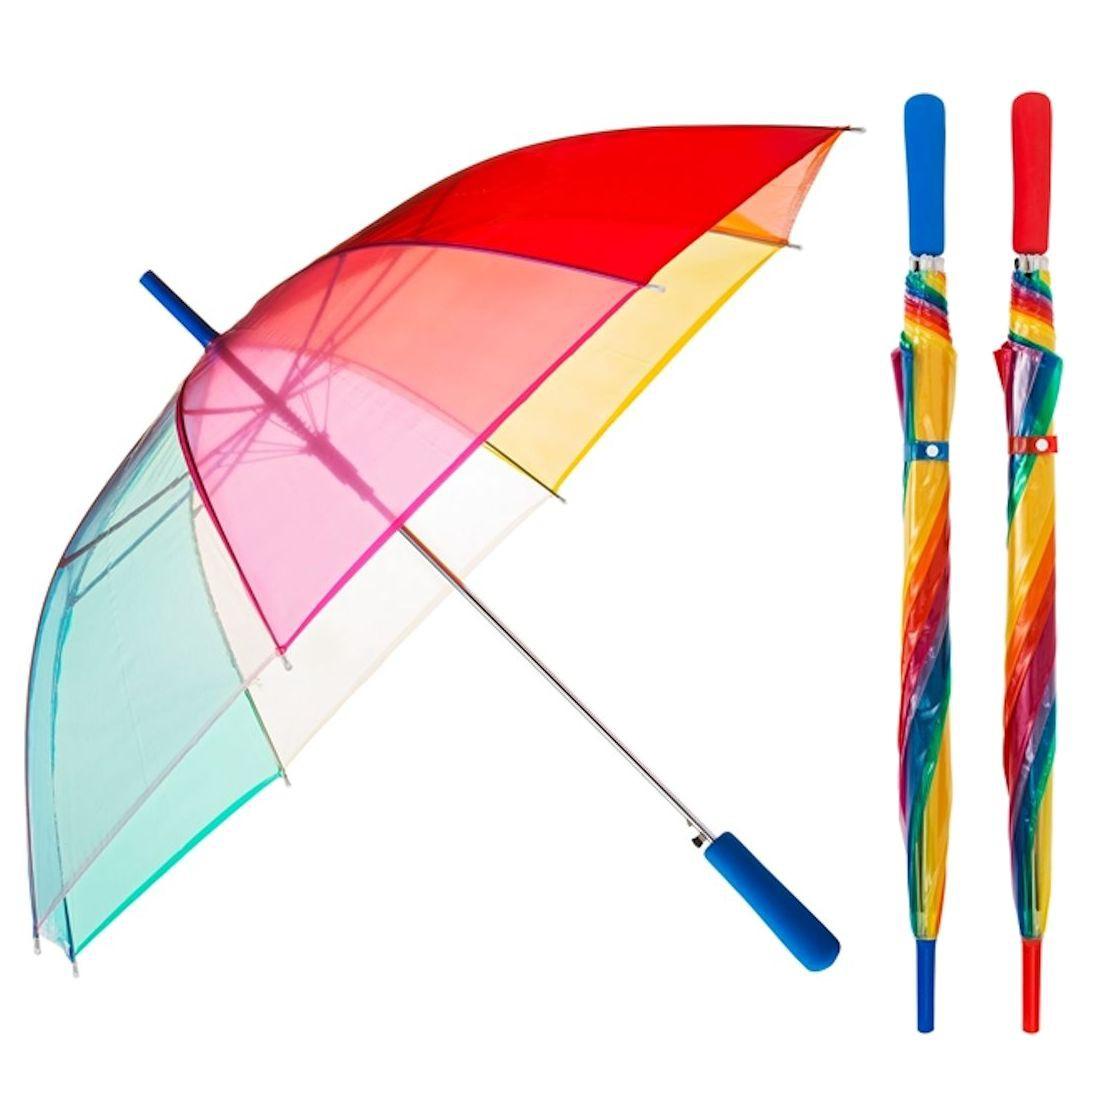 Regenschirm Transparent Durchsichtig Regenbogen